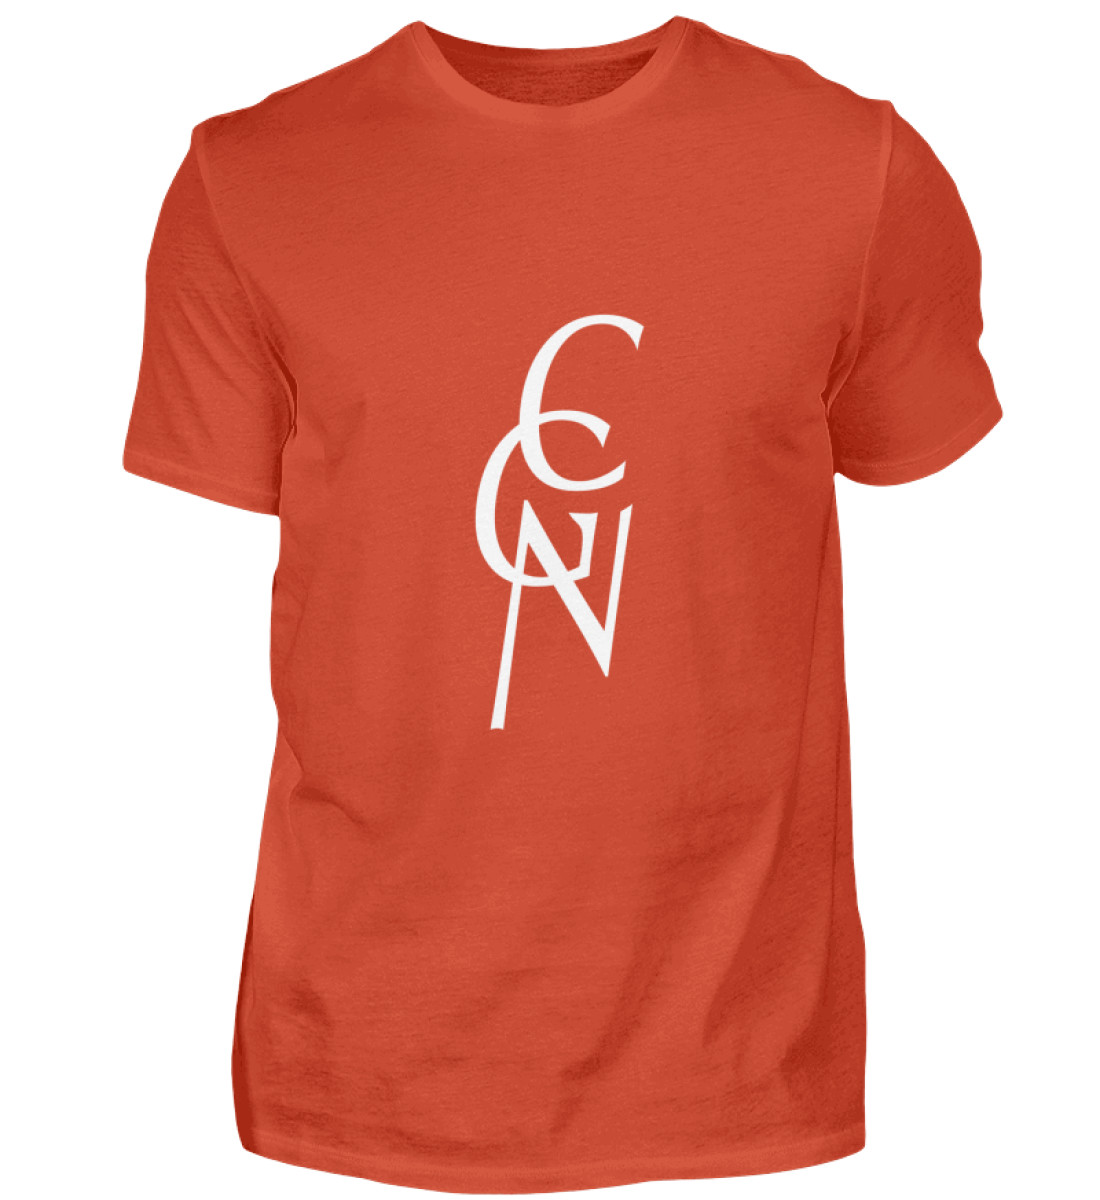 CGN - T-Shirt Herren - Herren Shirt-1236